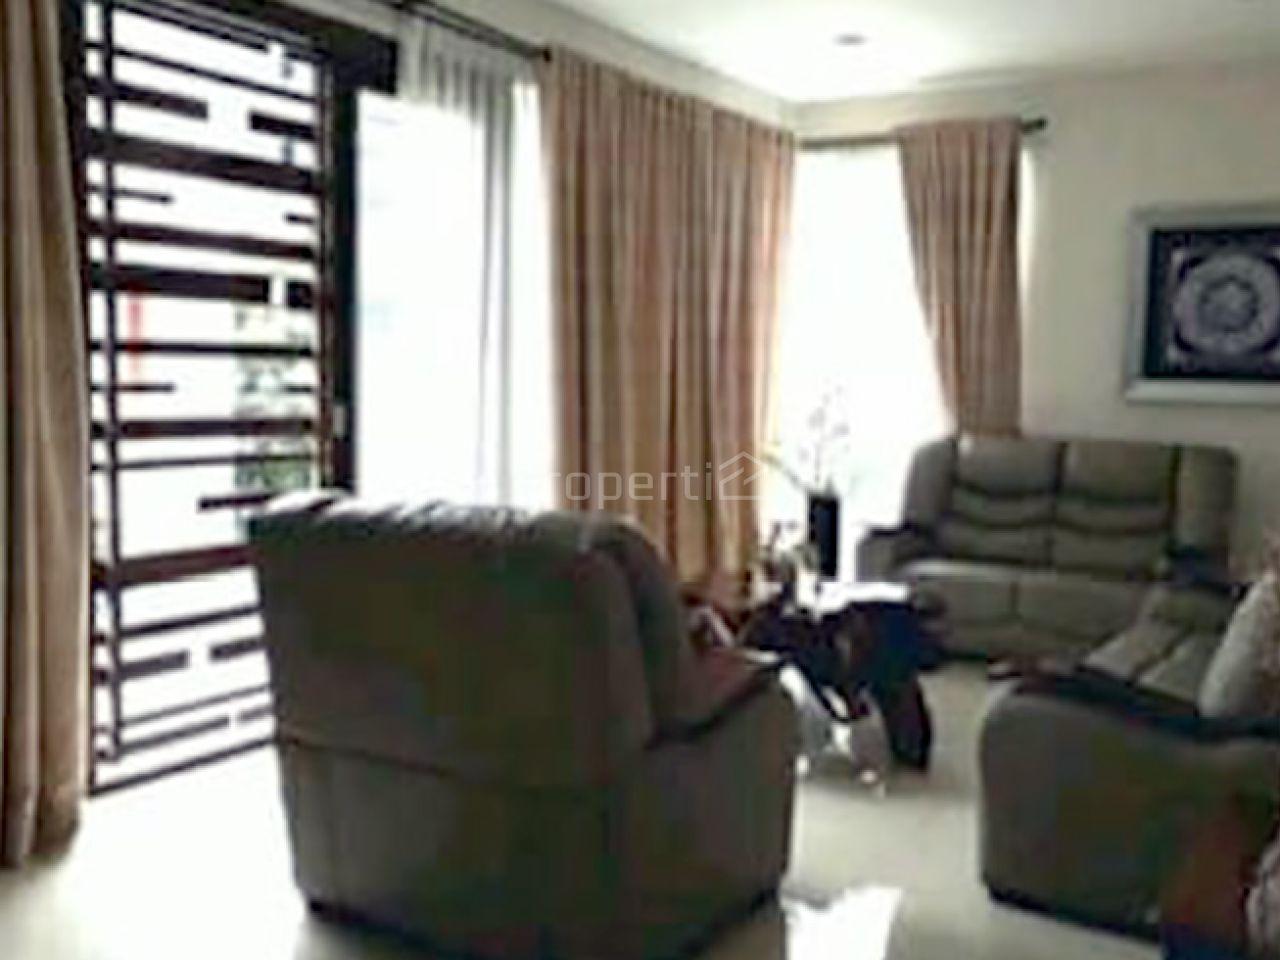 A Luxury House Hook Position in Pondok Indah, DKI Jakarta